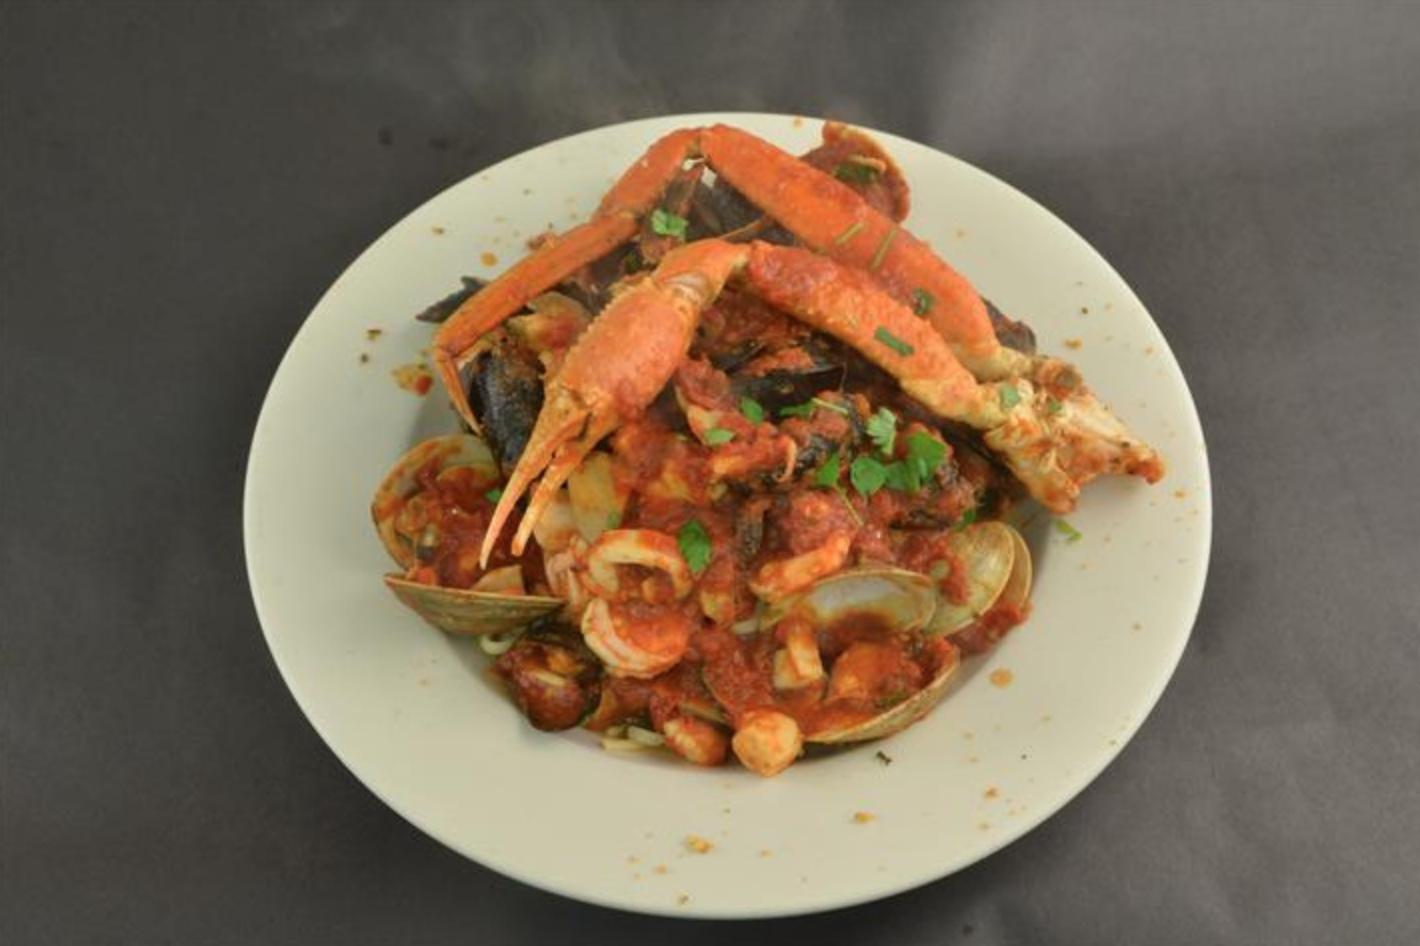 Best Seafood Restaurants Long Island (Popei's)